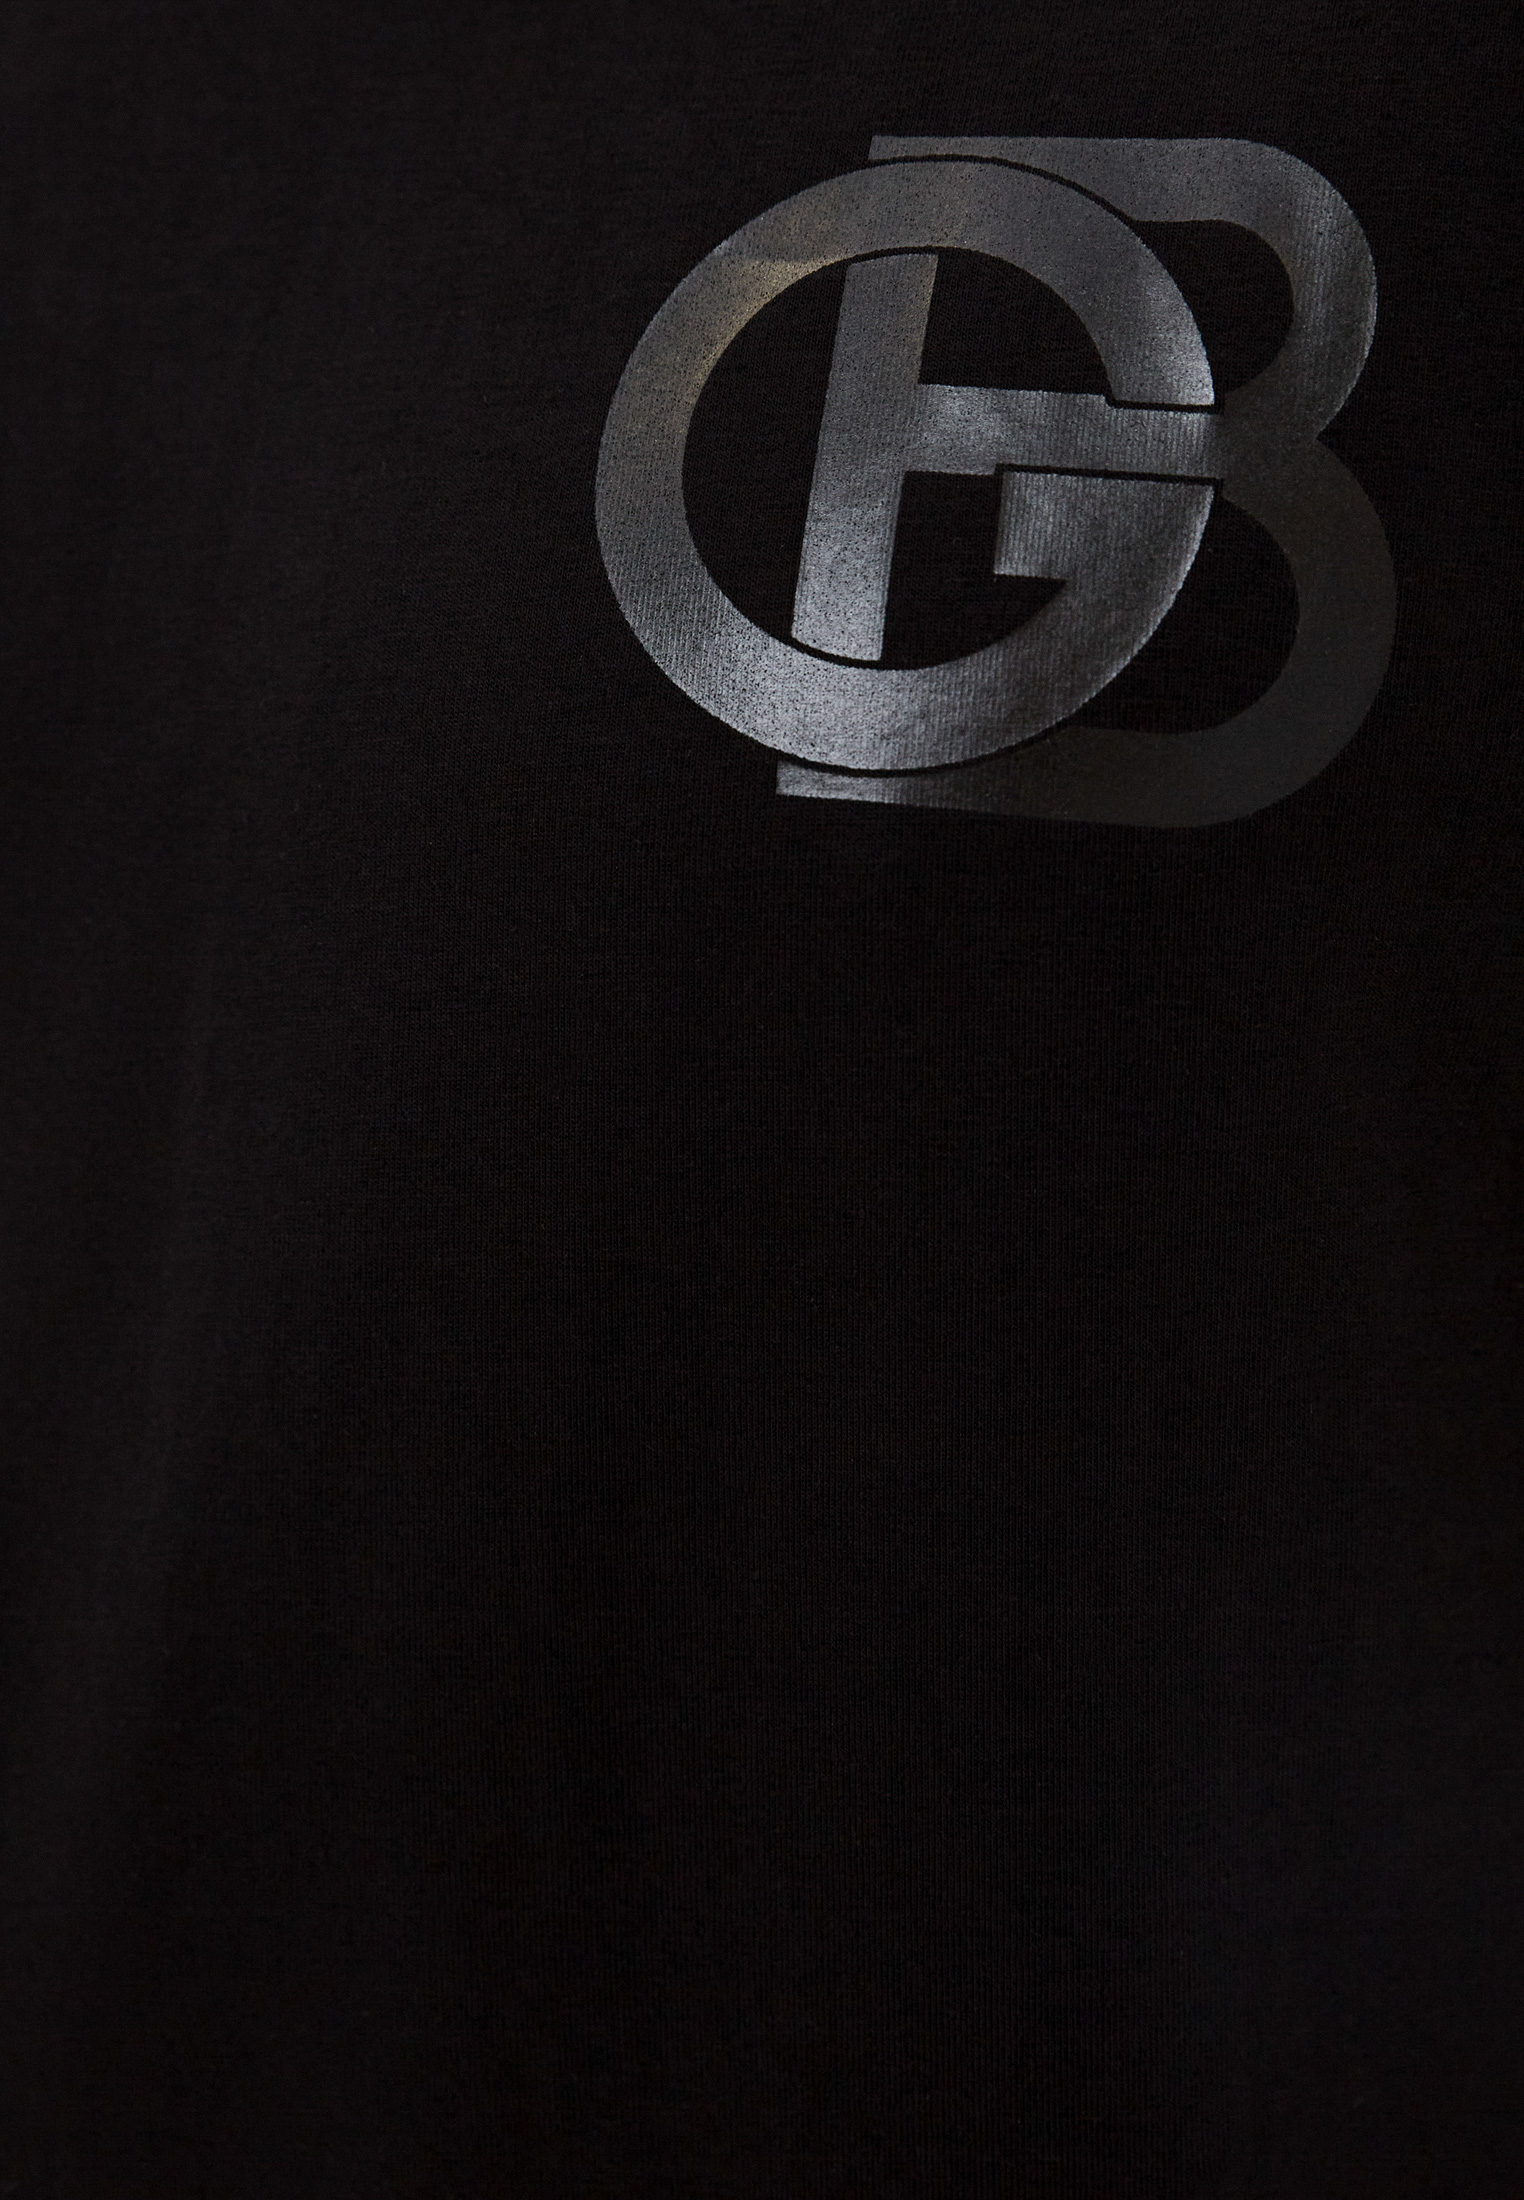 Мужская футболка Baldinini (Балдинини) TSU01: изображение 5